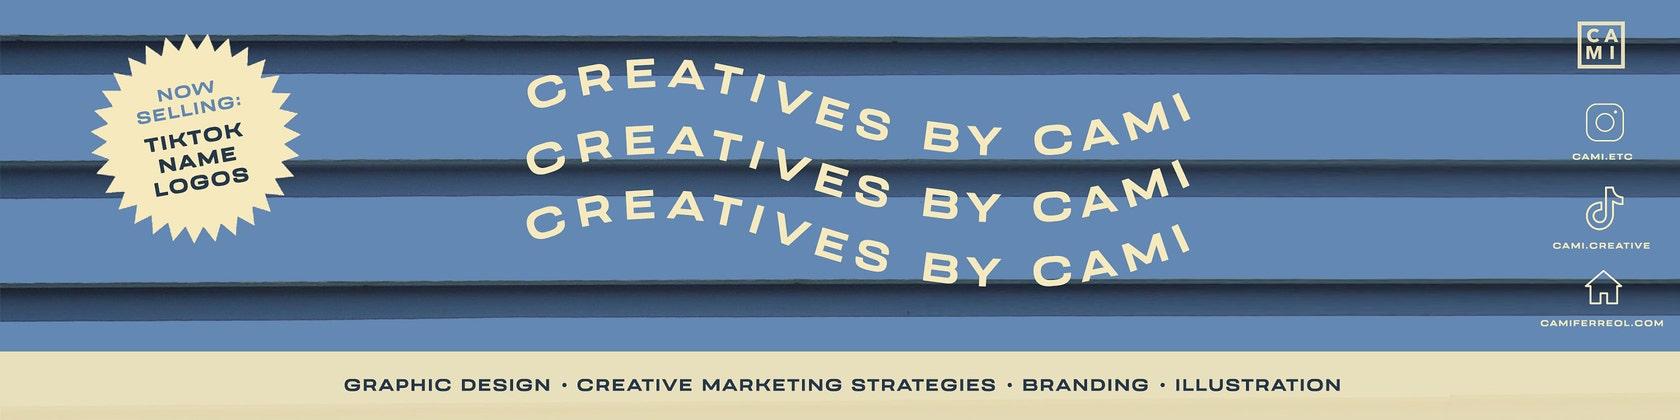 Name Logos Tiktok Name Logos By Creativesbycami On Etsy